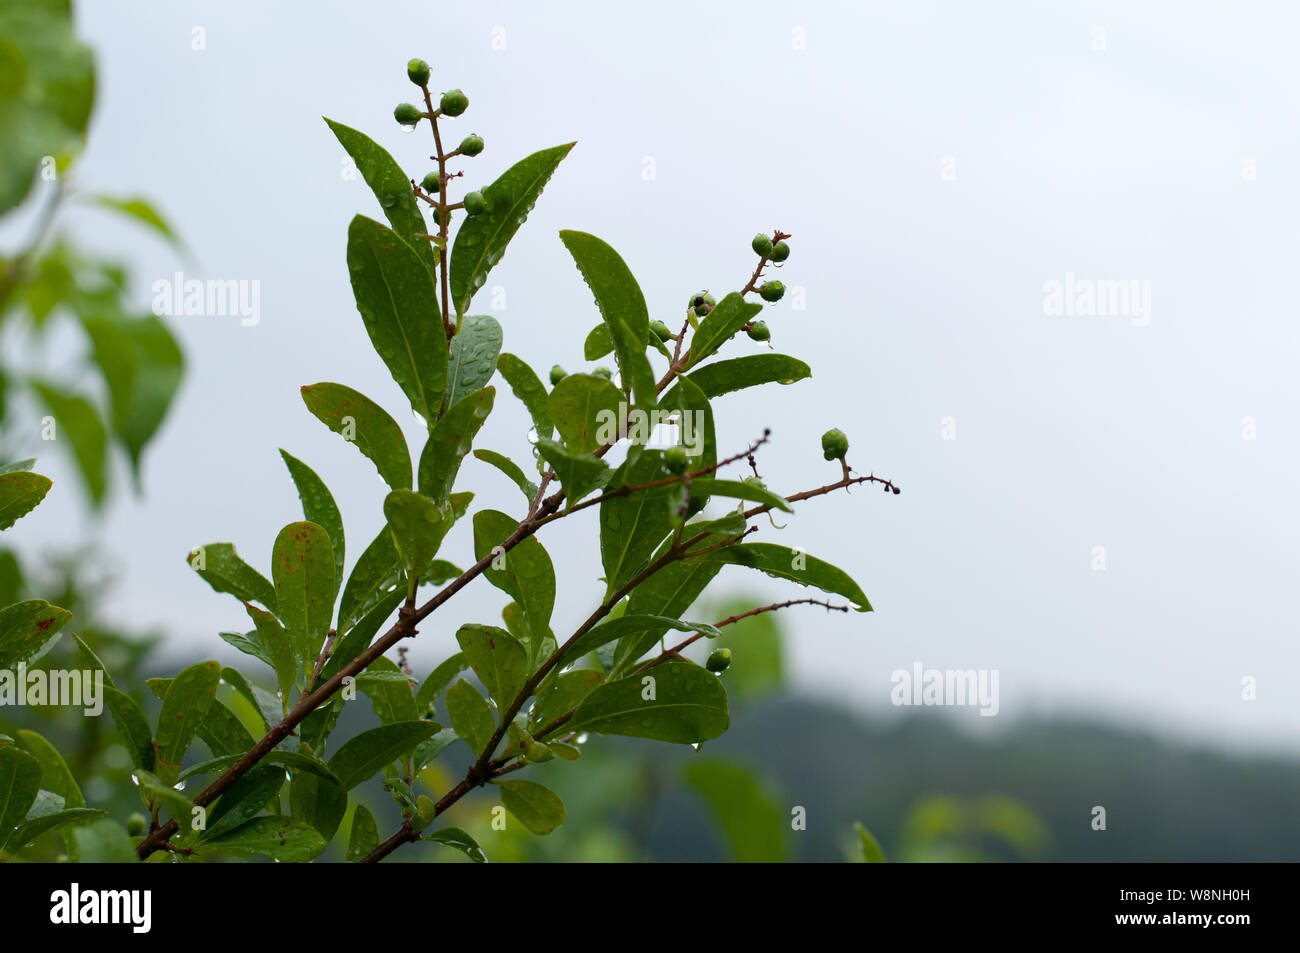 Privet Hedge Leaves Stock Photos & Privet Hedge Leaves Stock